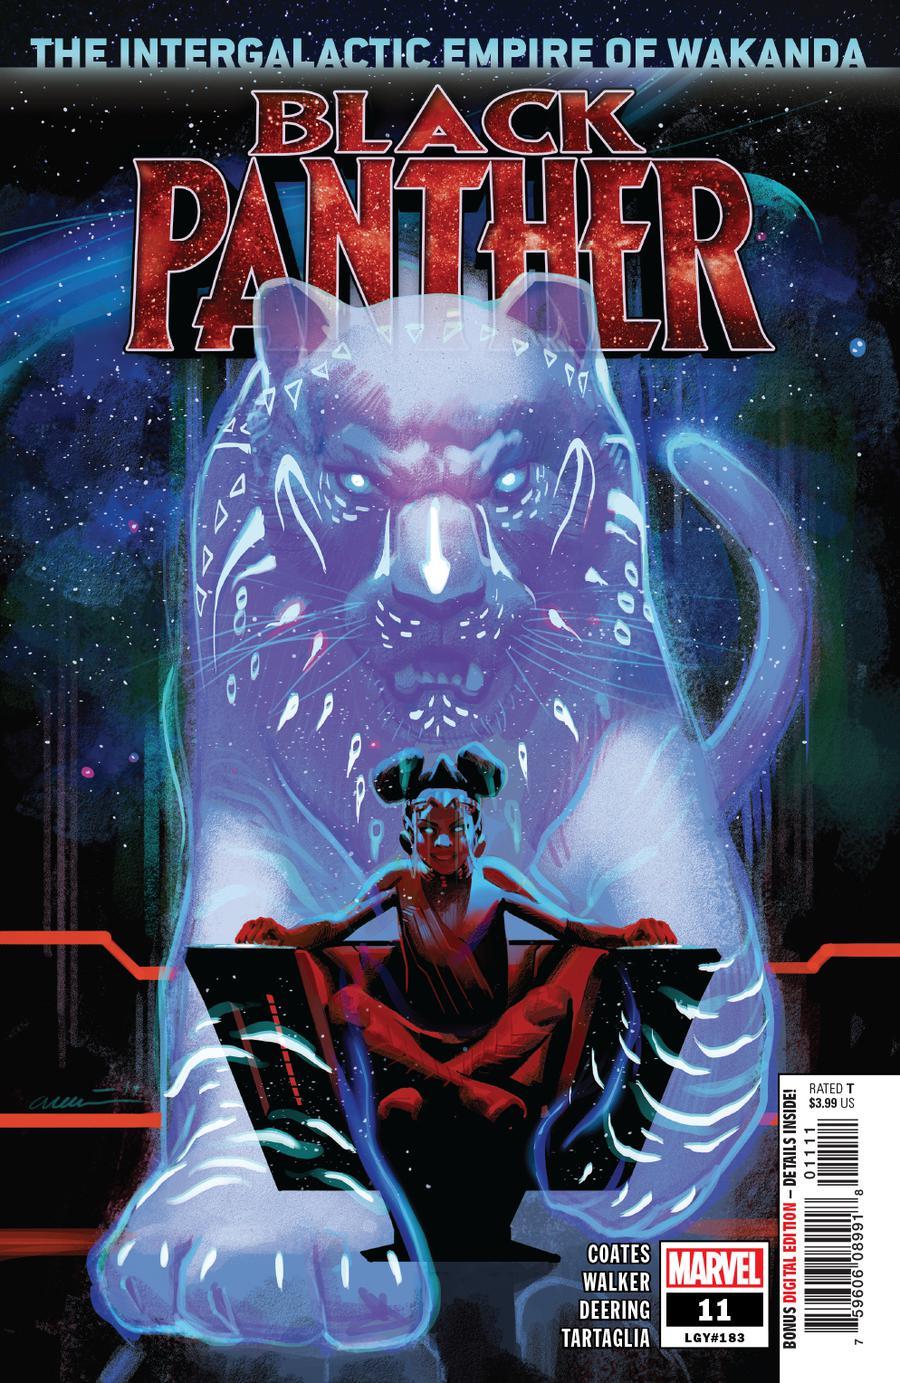 Black Panther Vol 7 #11 Cover A Regular Daniel Acuna Cover